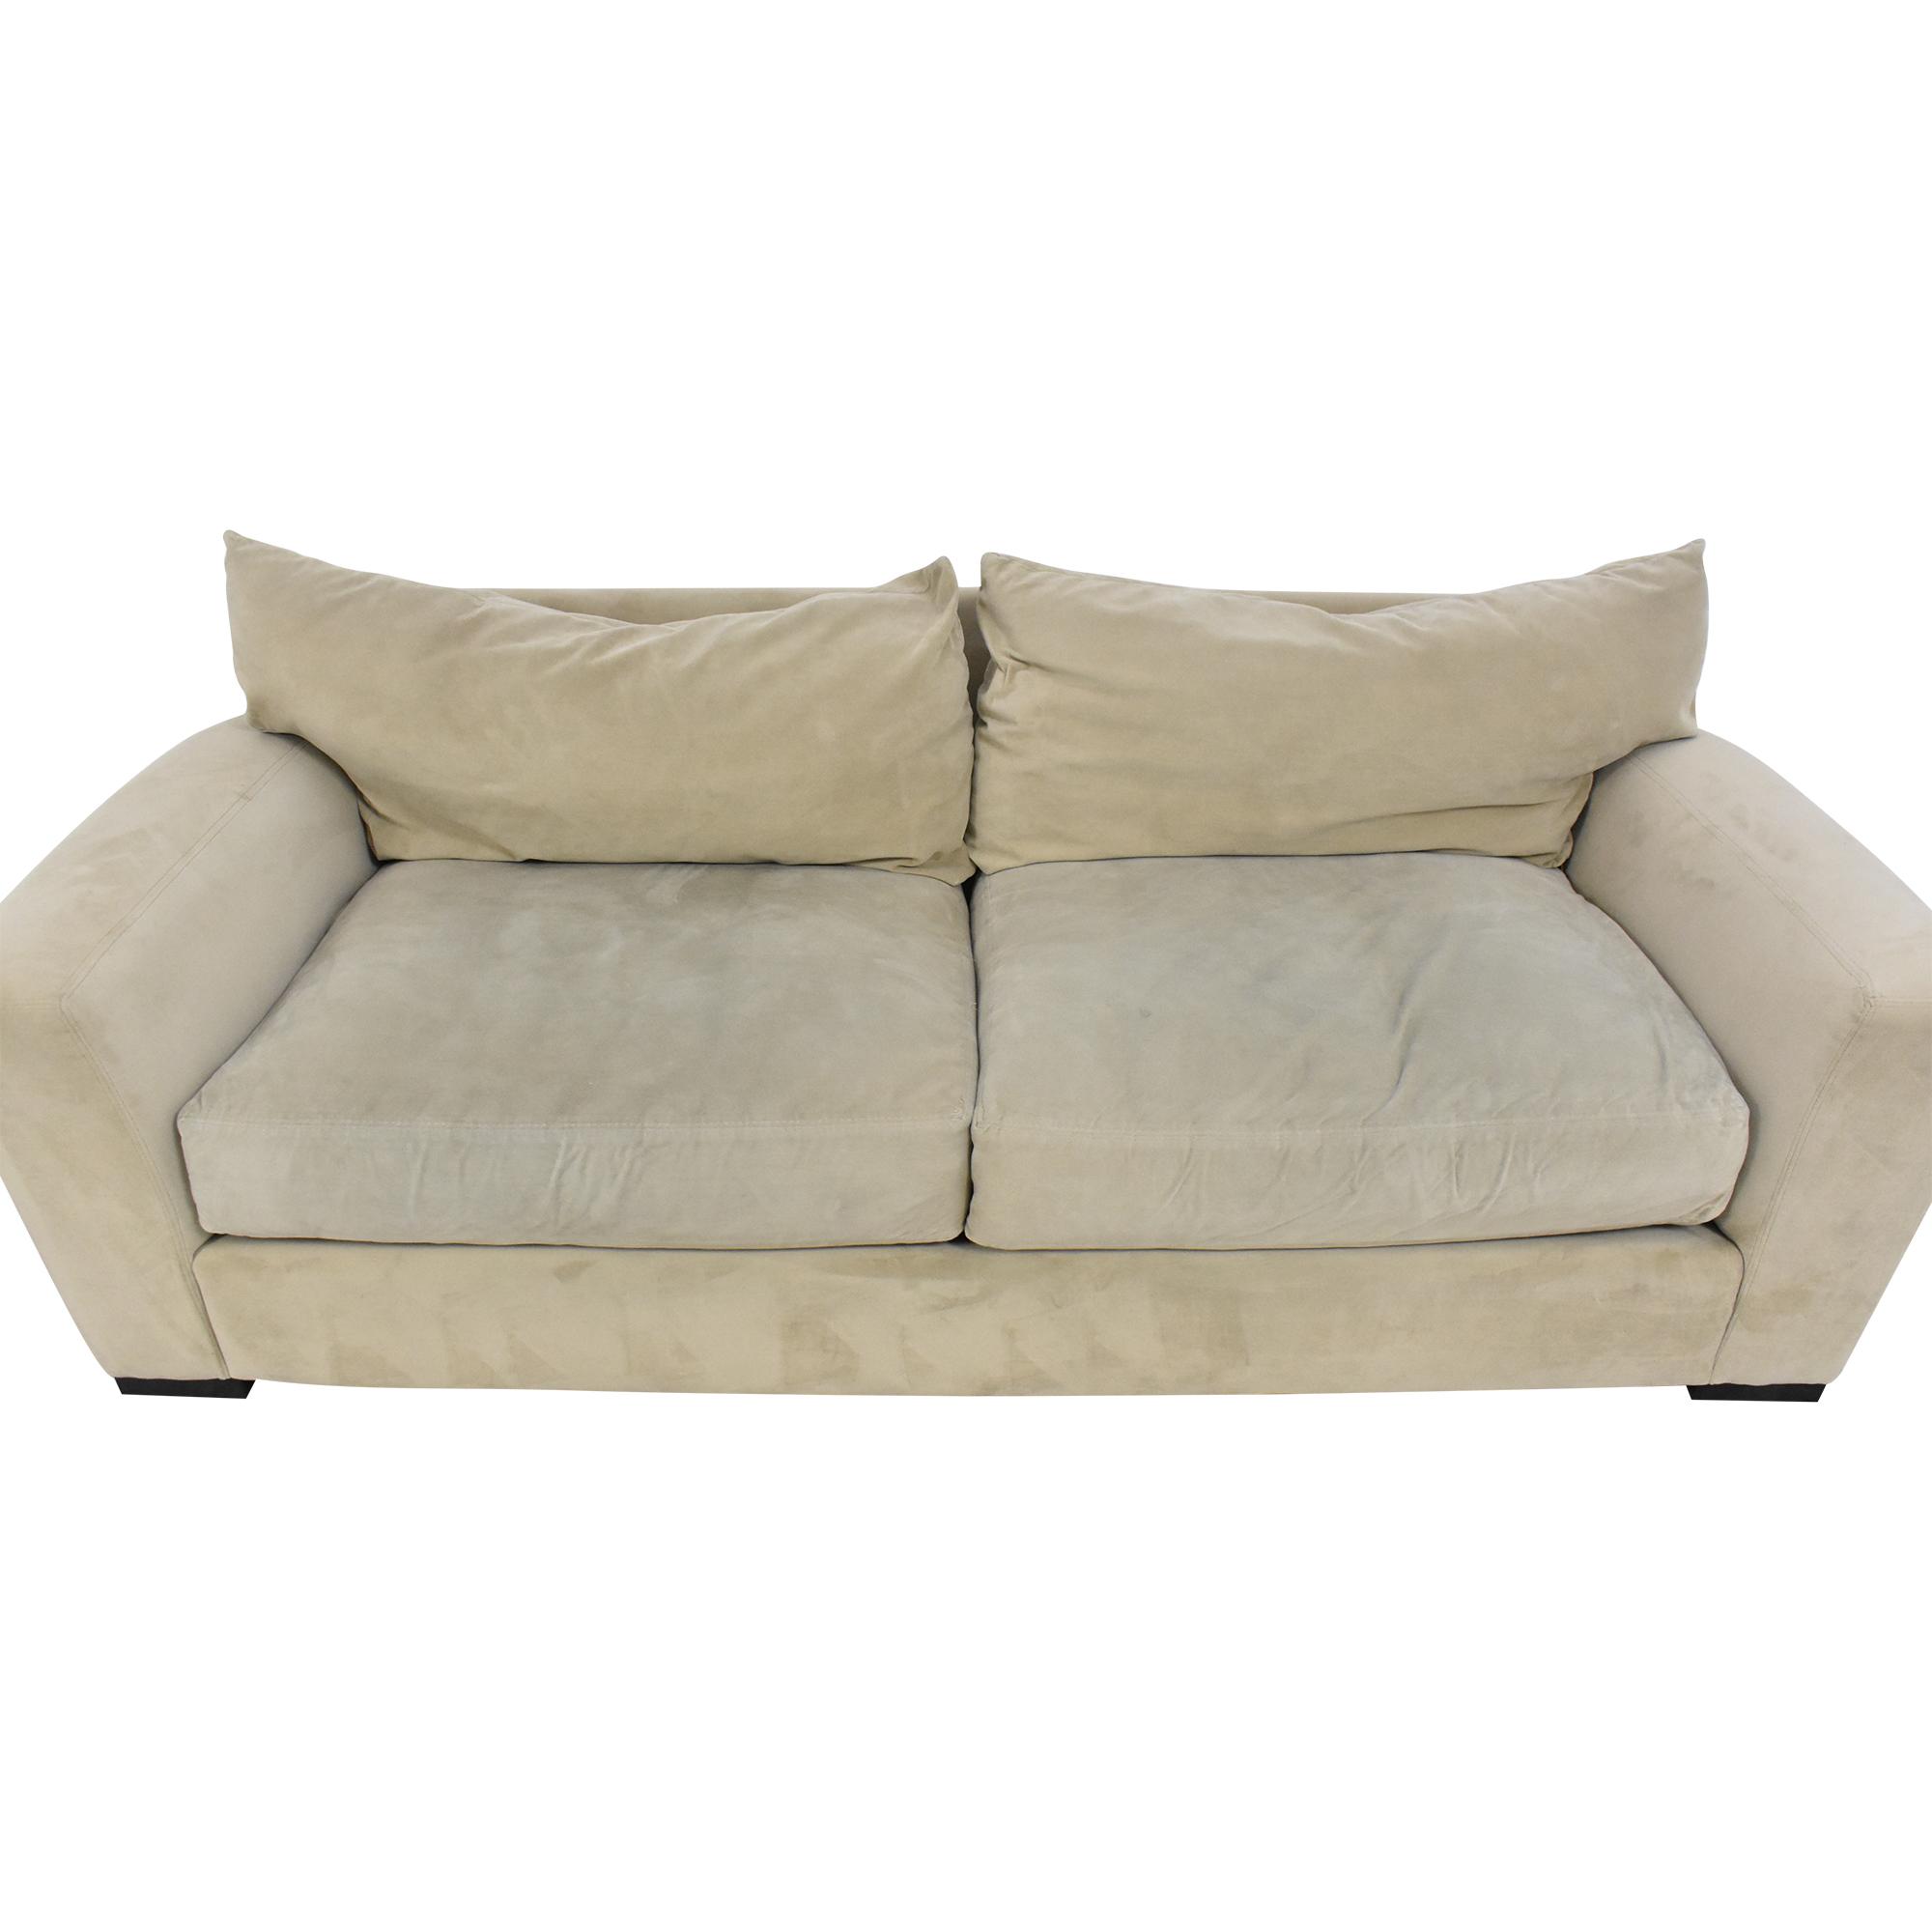 Raymour & Flanigan Raymour & Flanigan Two Cushion Sofa nj